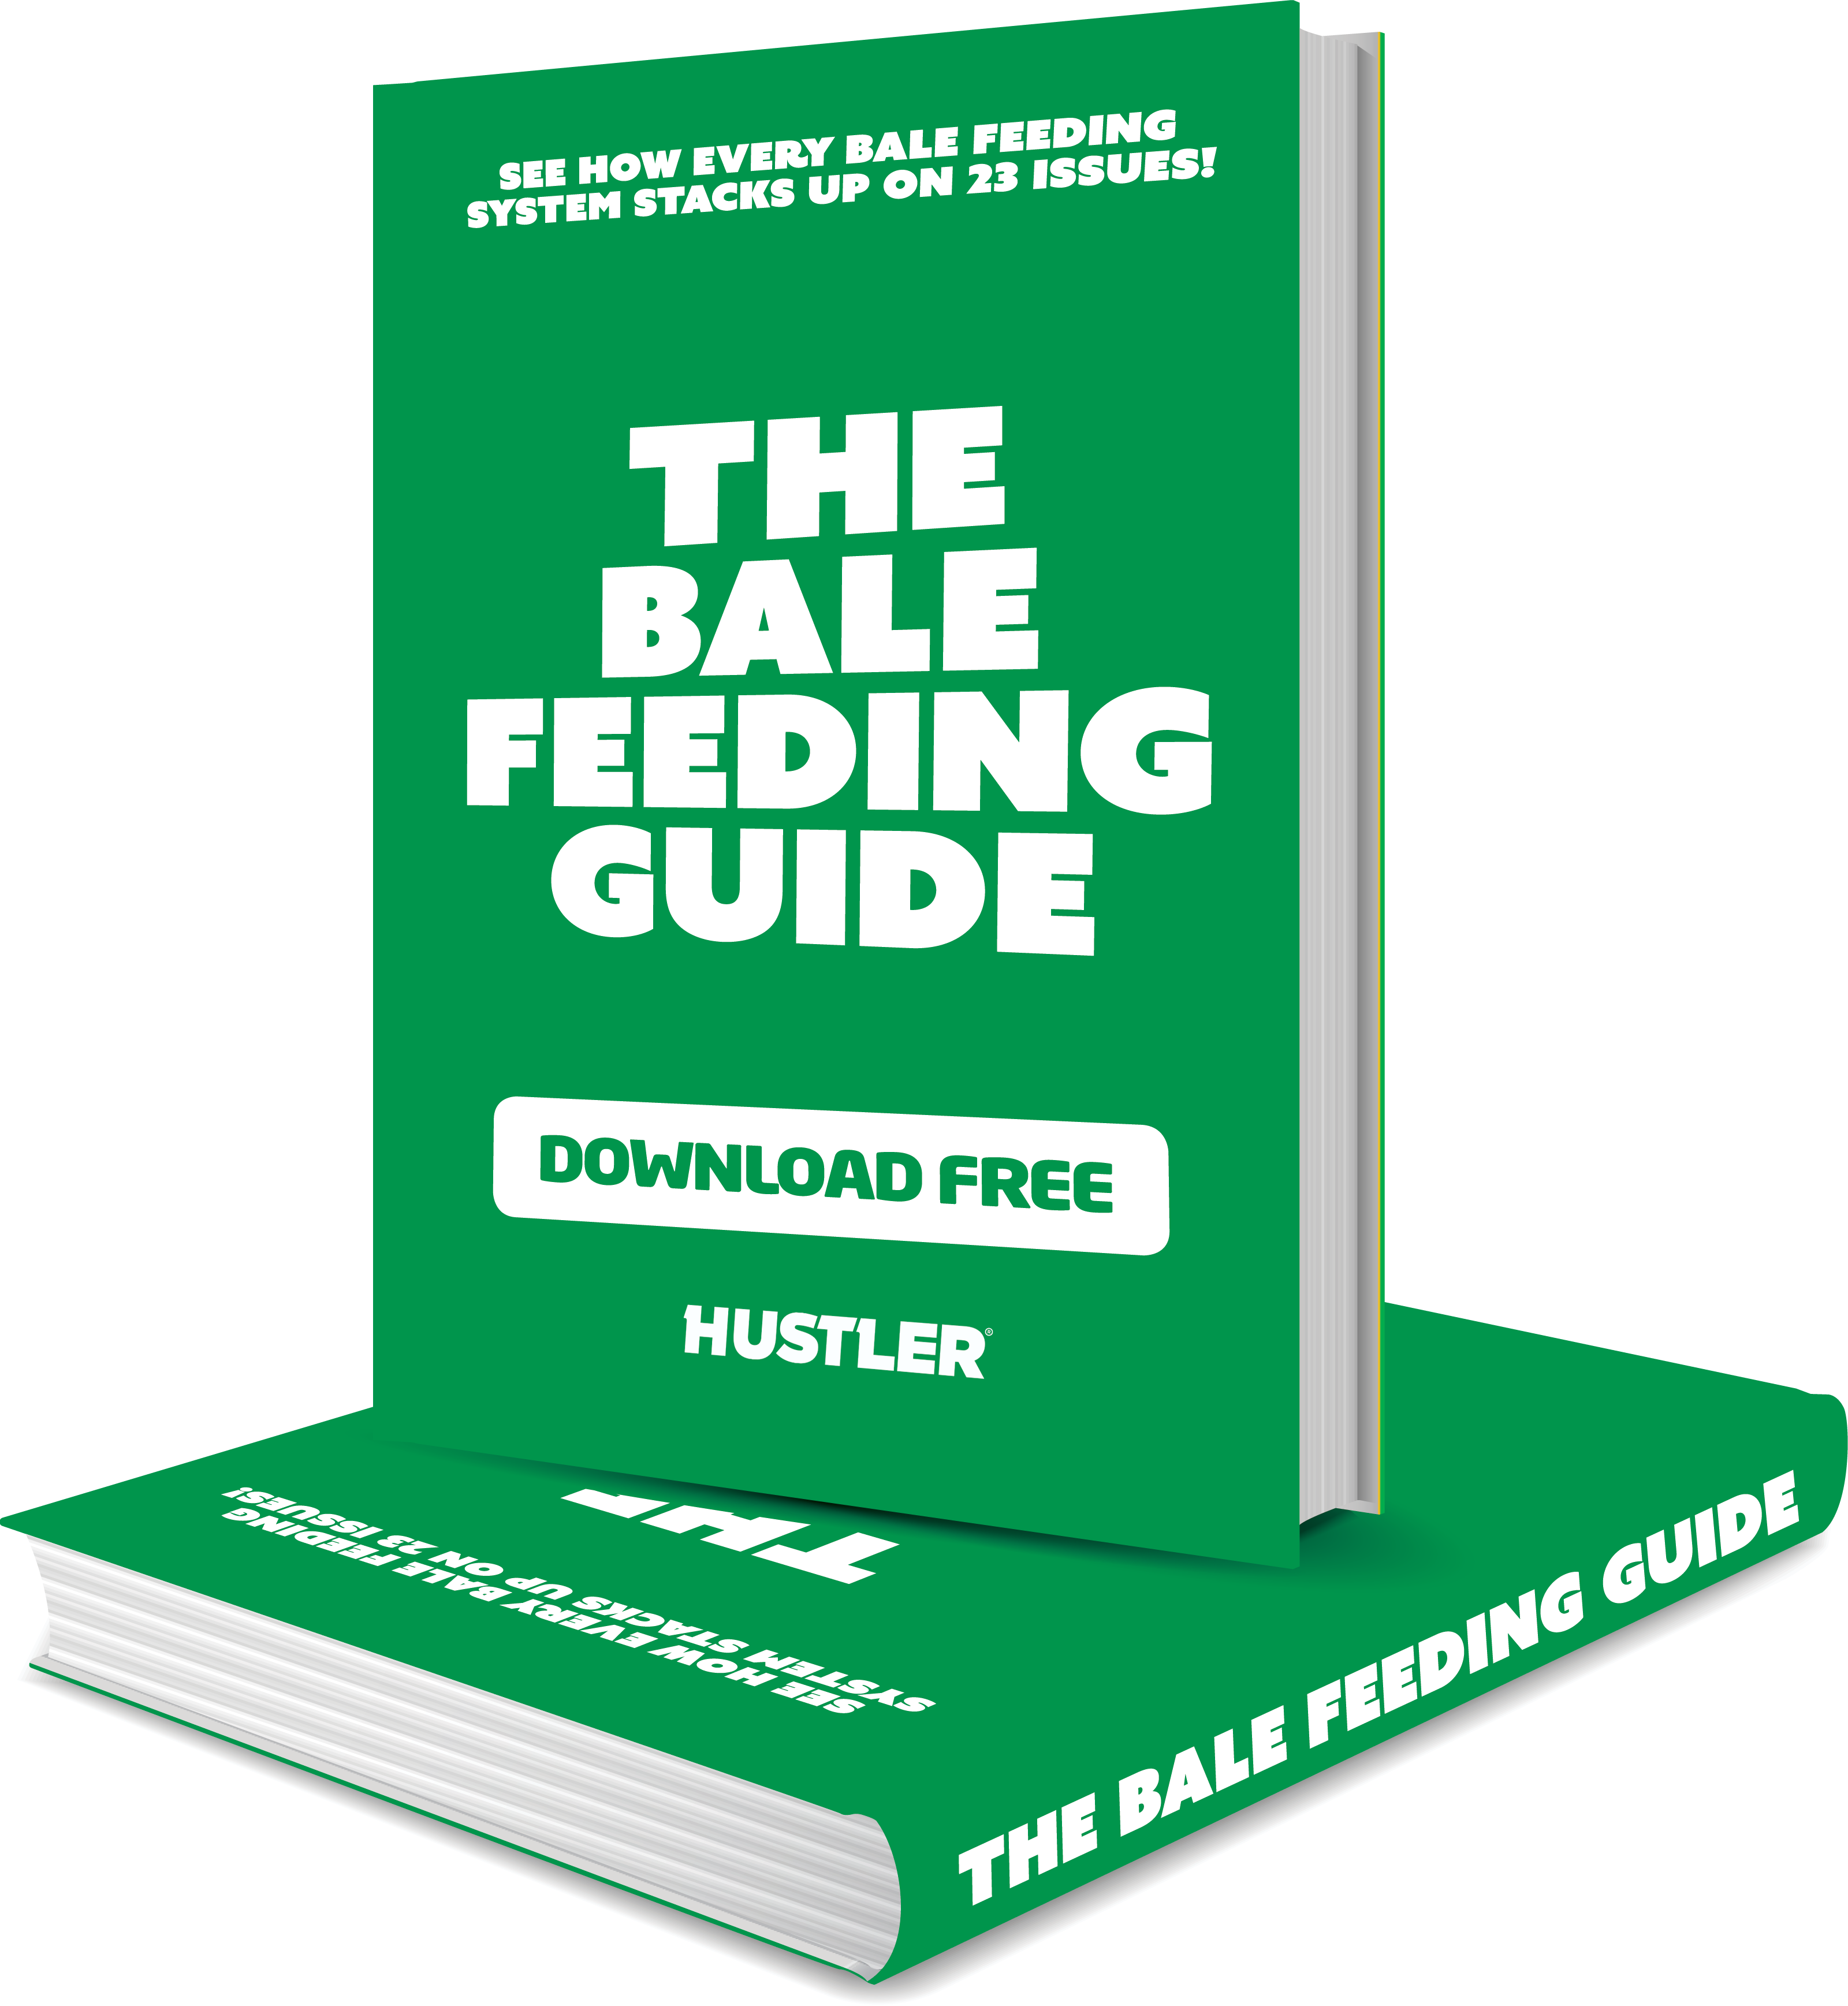 Bale feeder guide_NEW